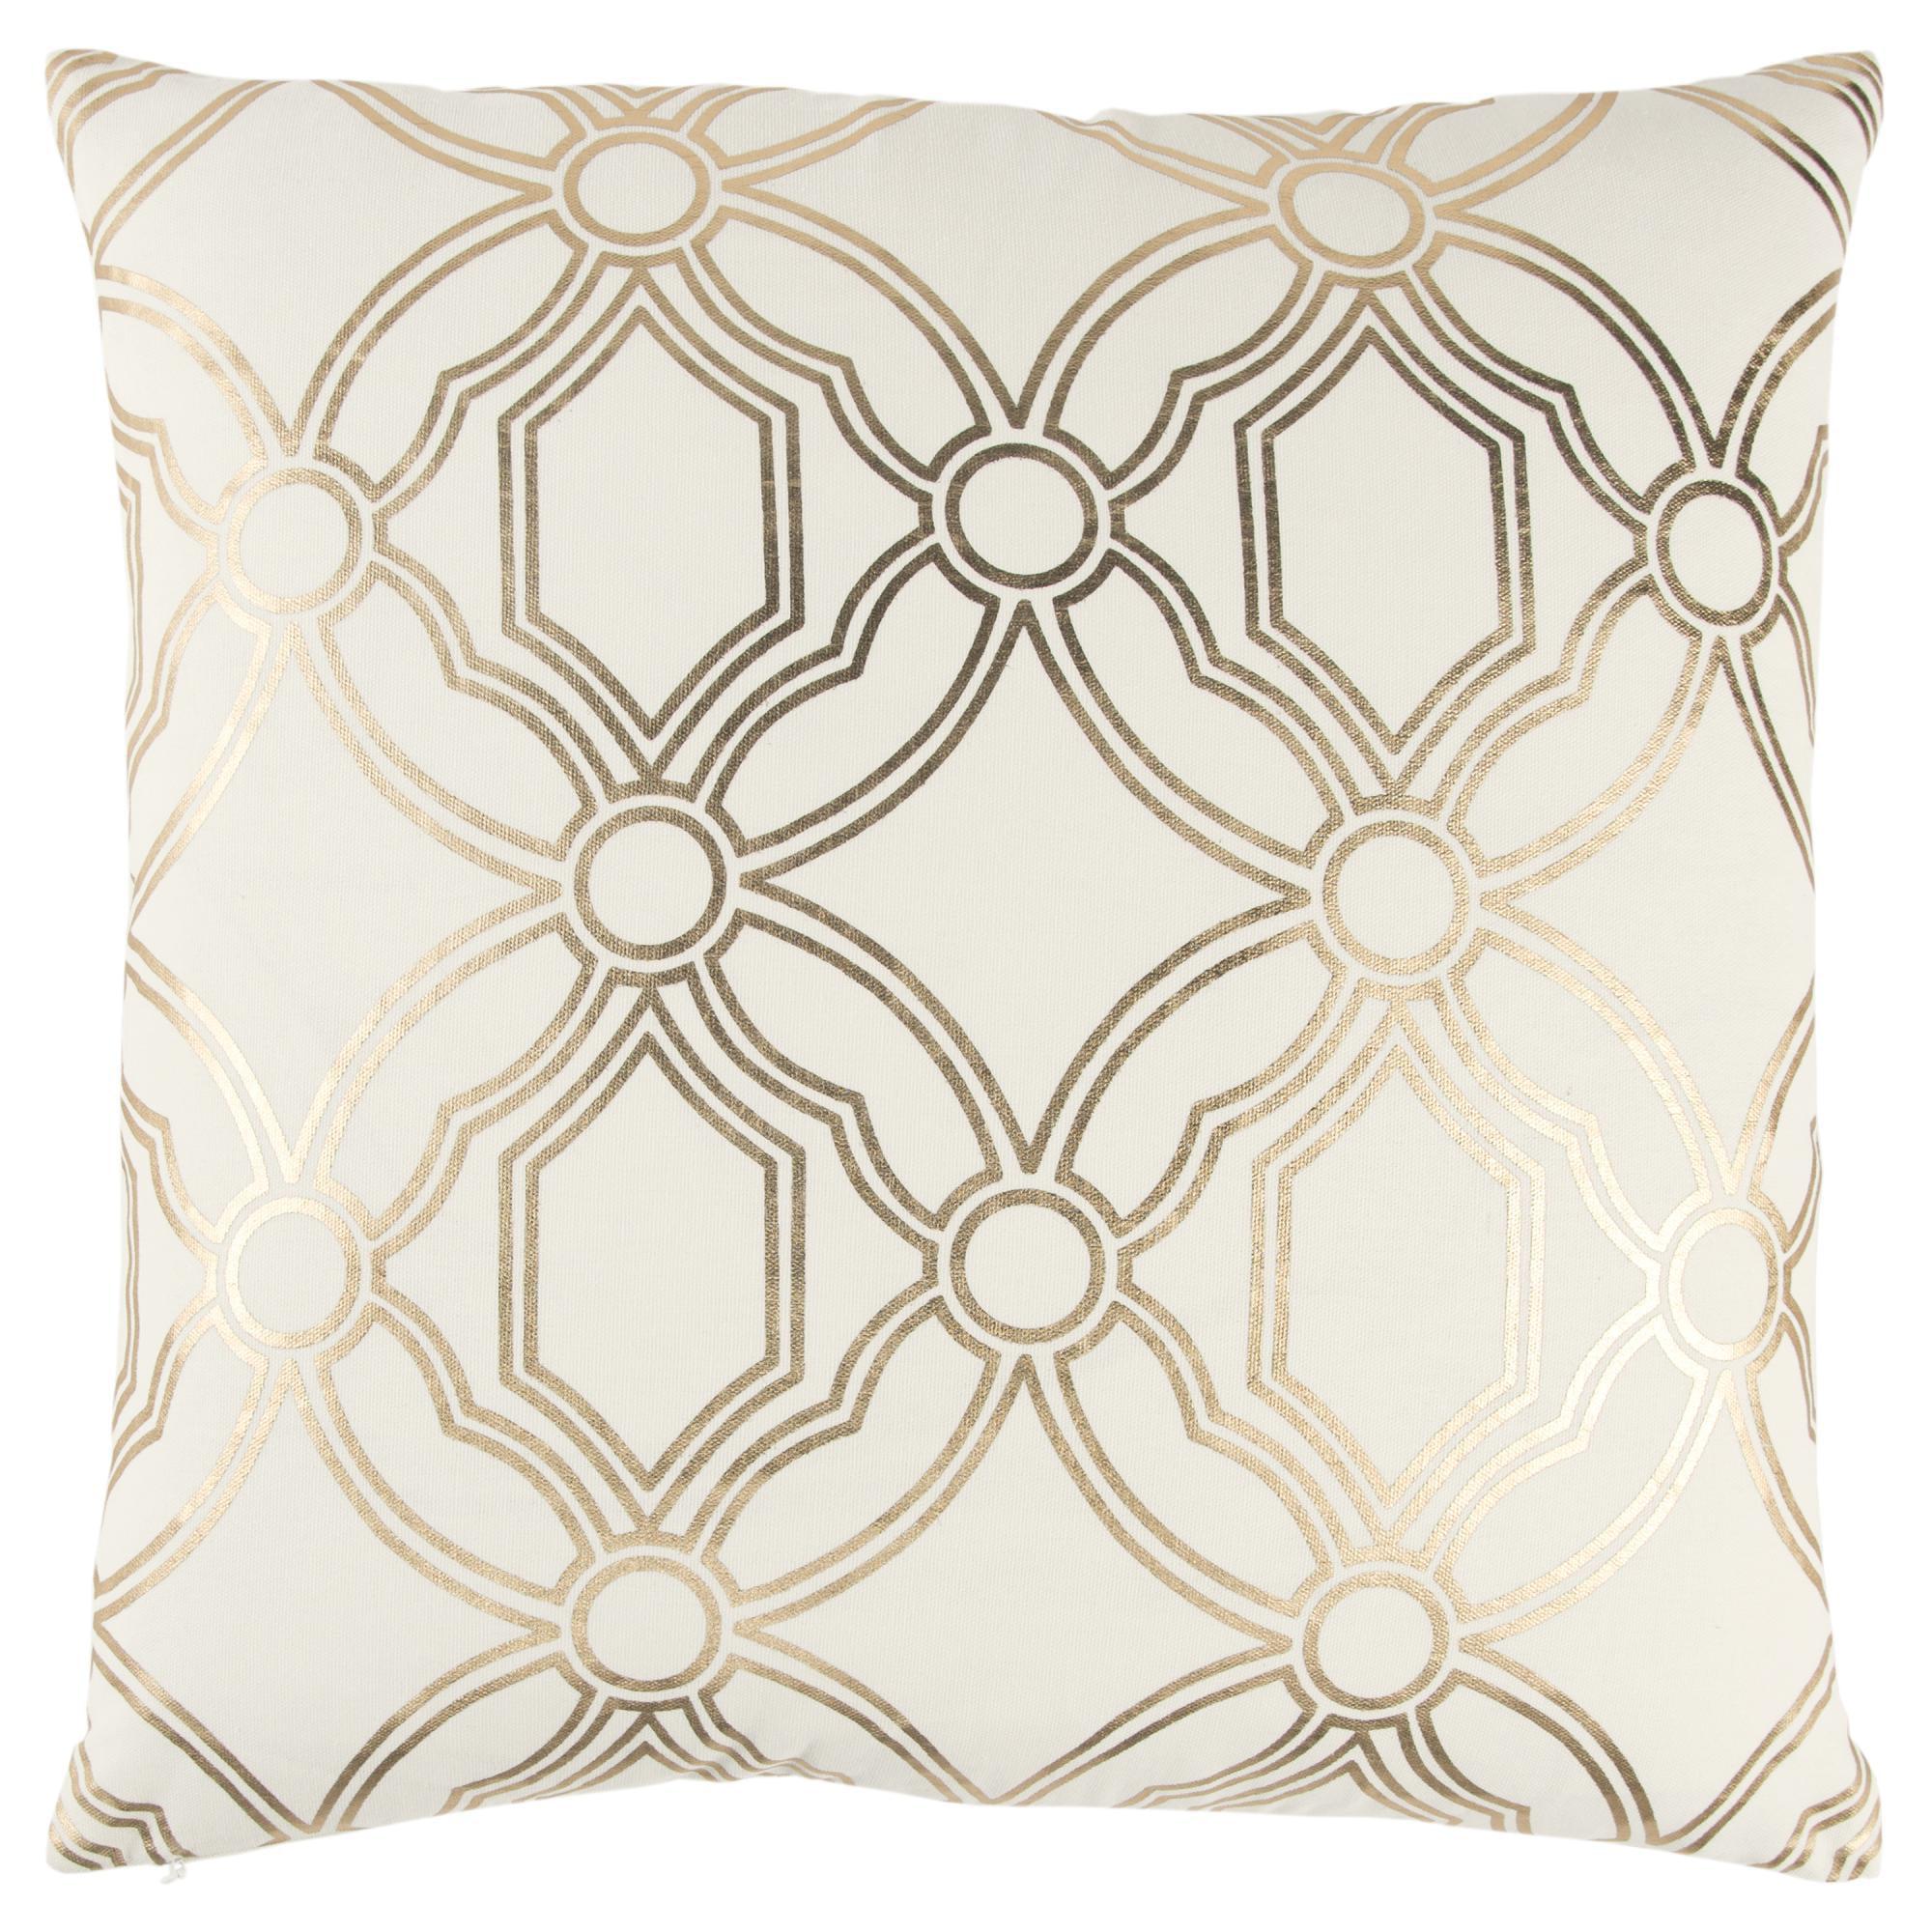 Rizzy Home Geometric Metallic Decorative Pillow